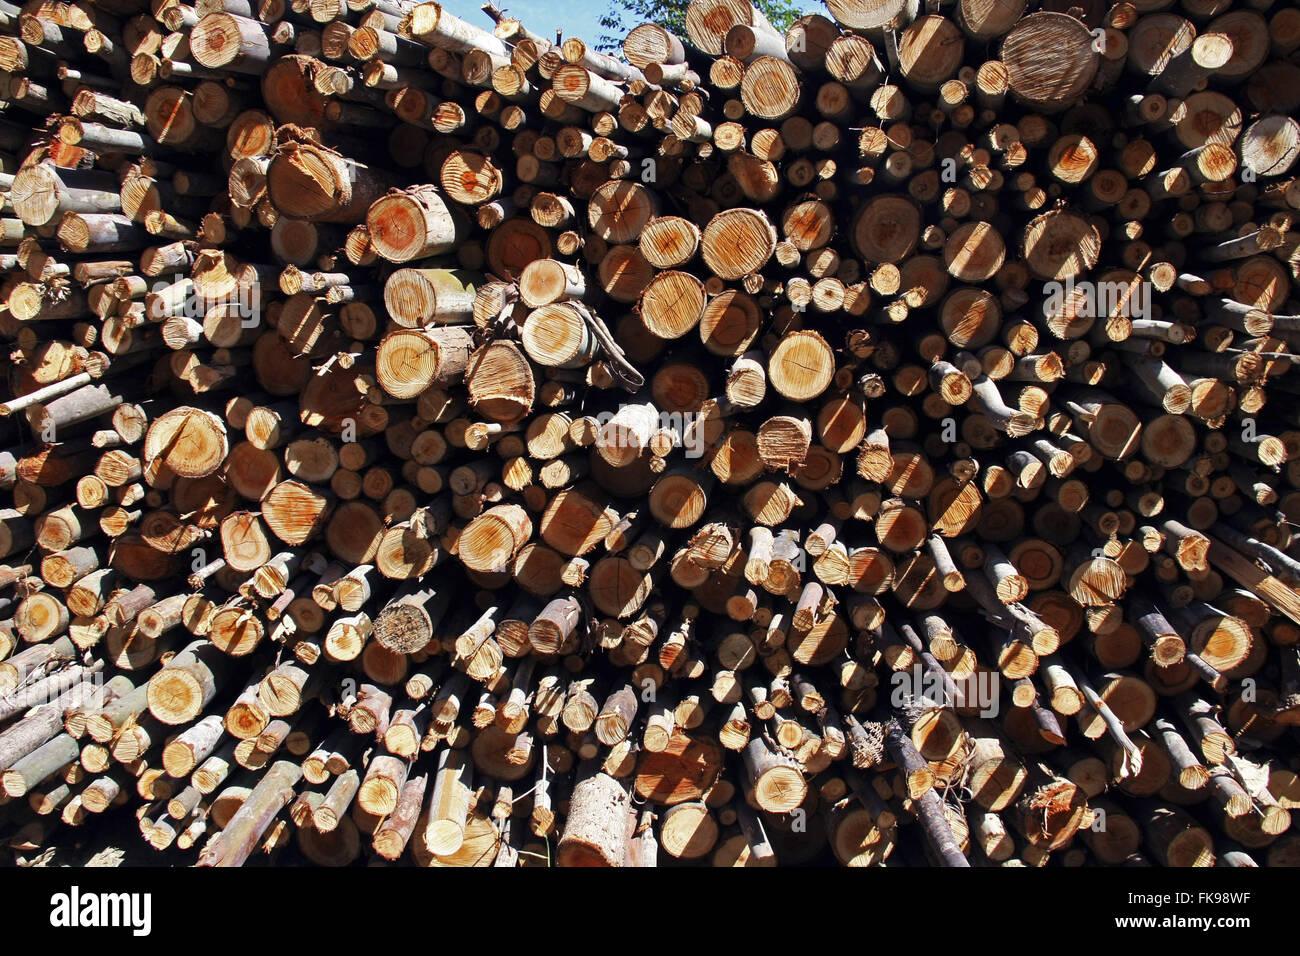 Eucalyptus stacked for use as firewood - Eucalyptus - Stock Image